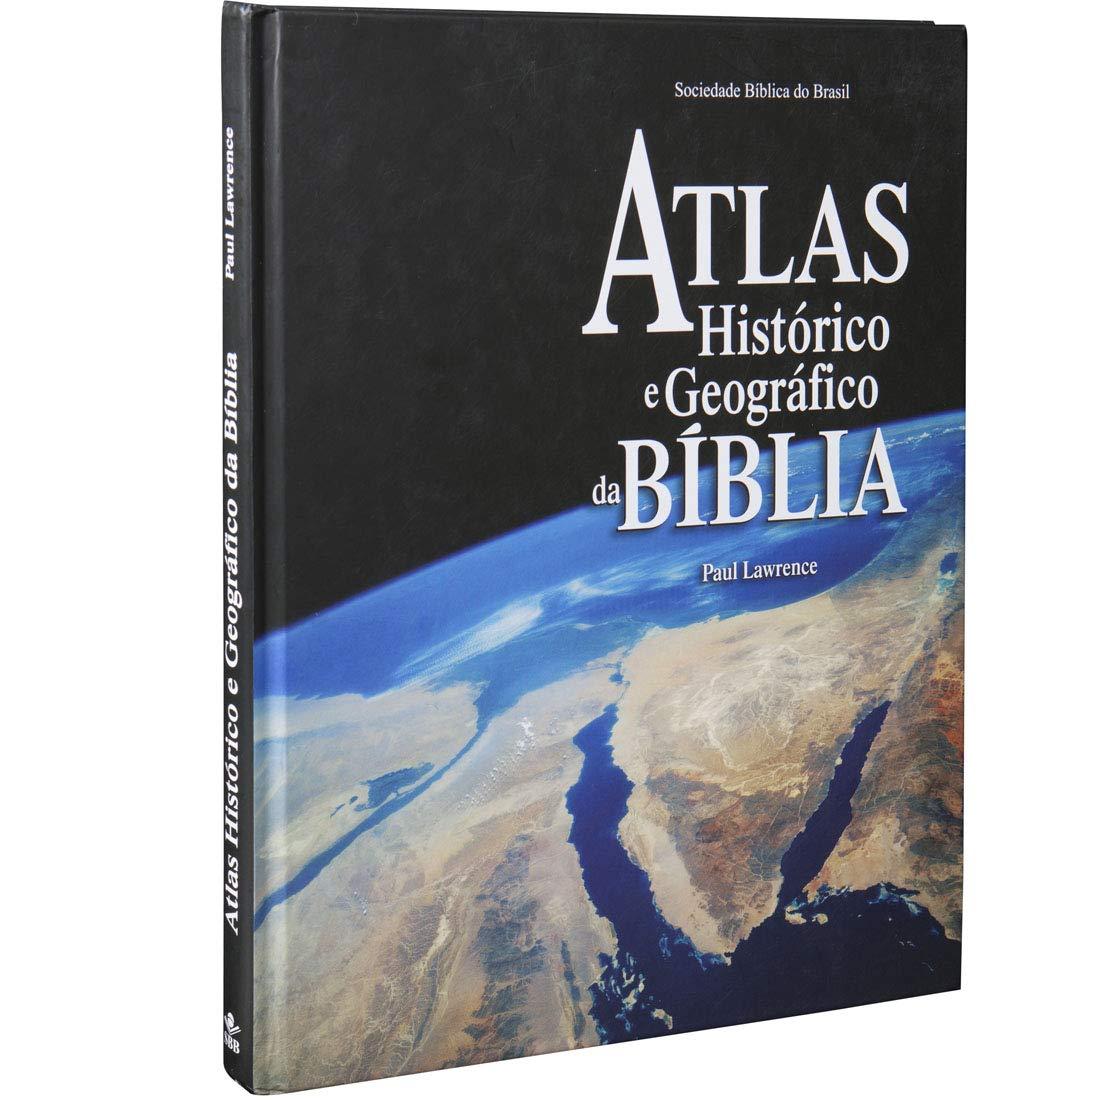 Atlas Histórico e Geográfico da Bíblia  - Universo Bíblico Rs